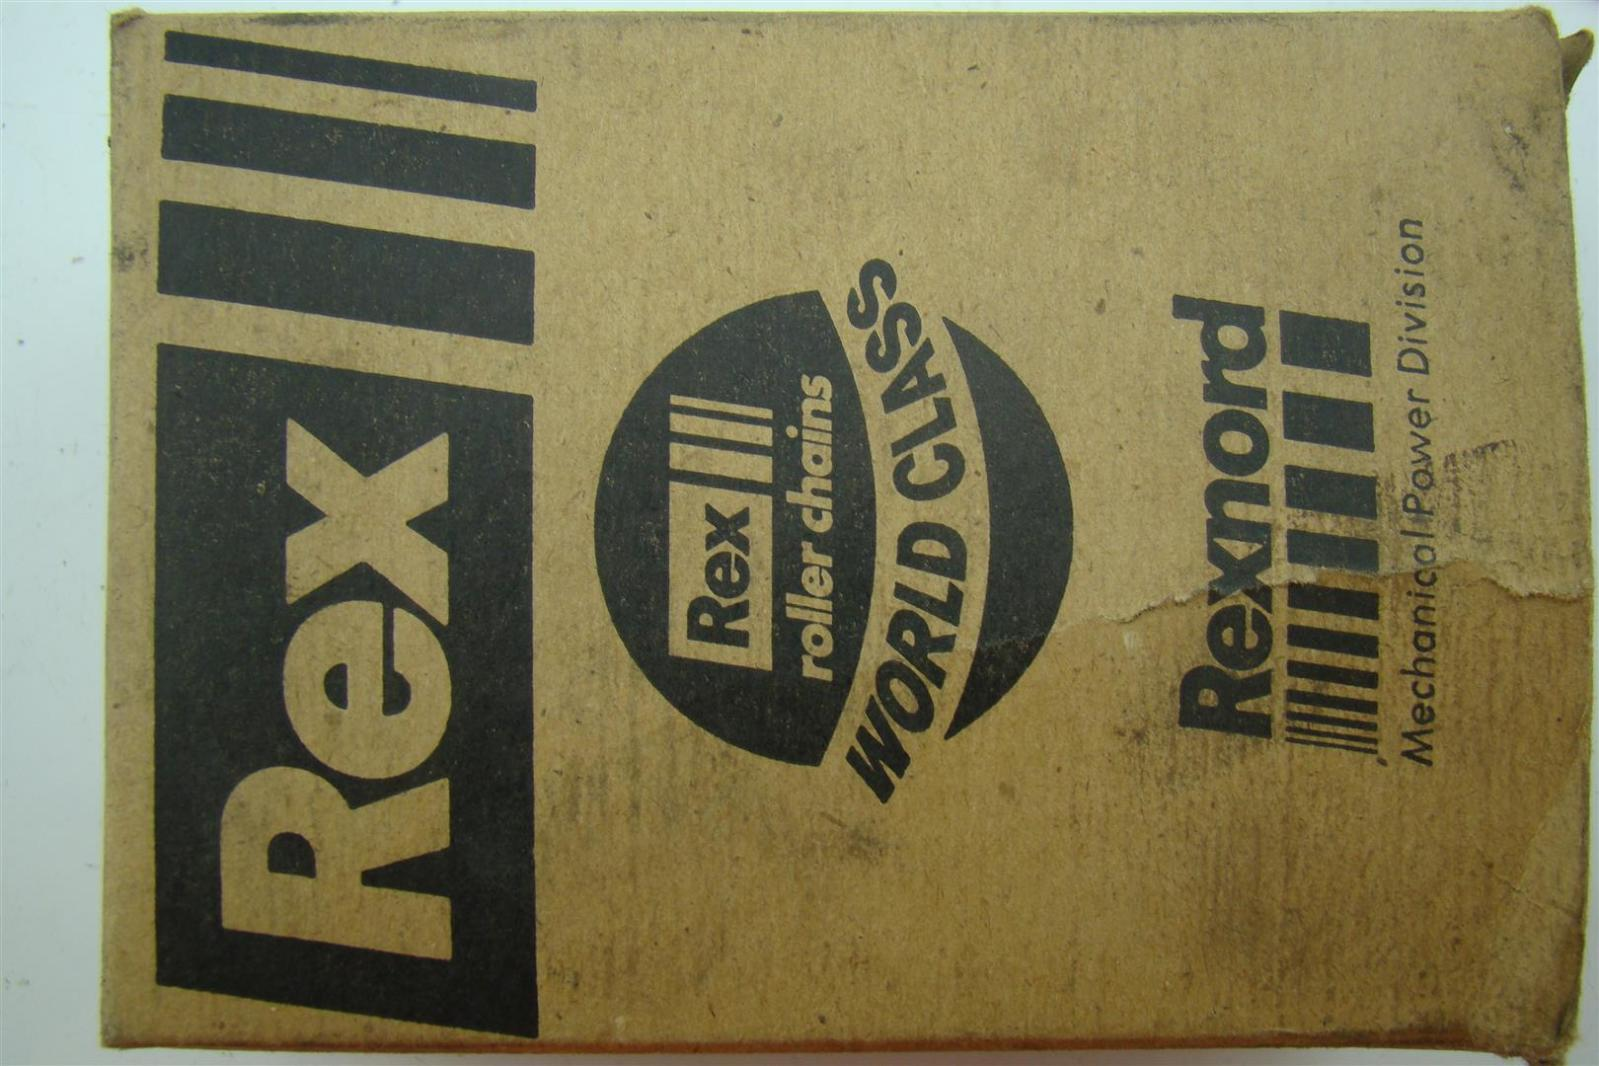 16 rex roller chain offset 1 2 links 35 joseph fazzio incorporated. Black Bedroom Furniture Sets. Home Design Ideas